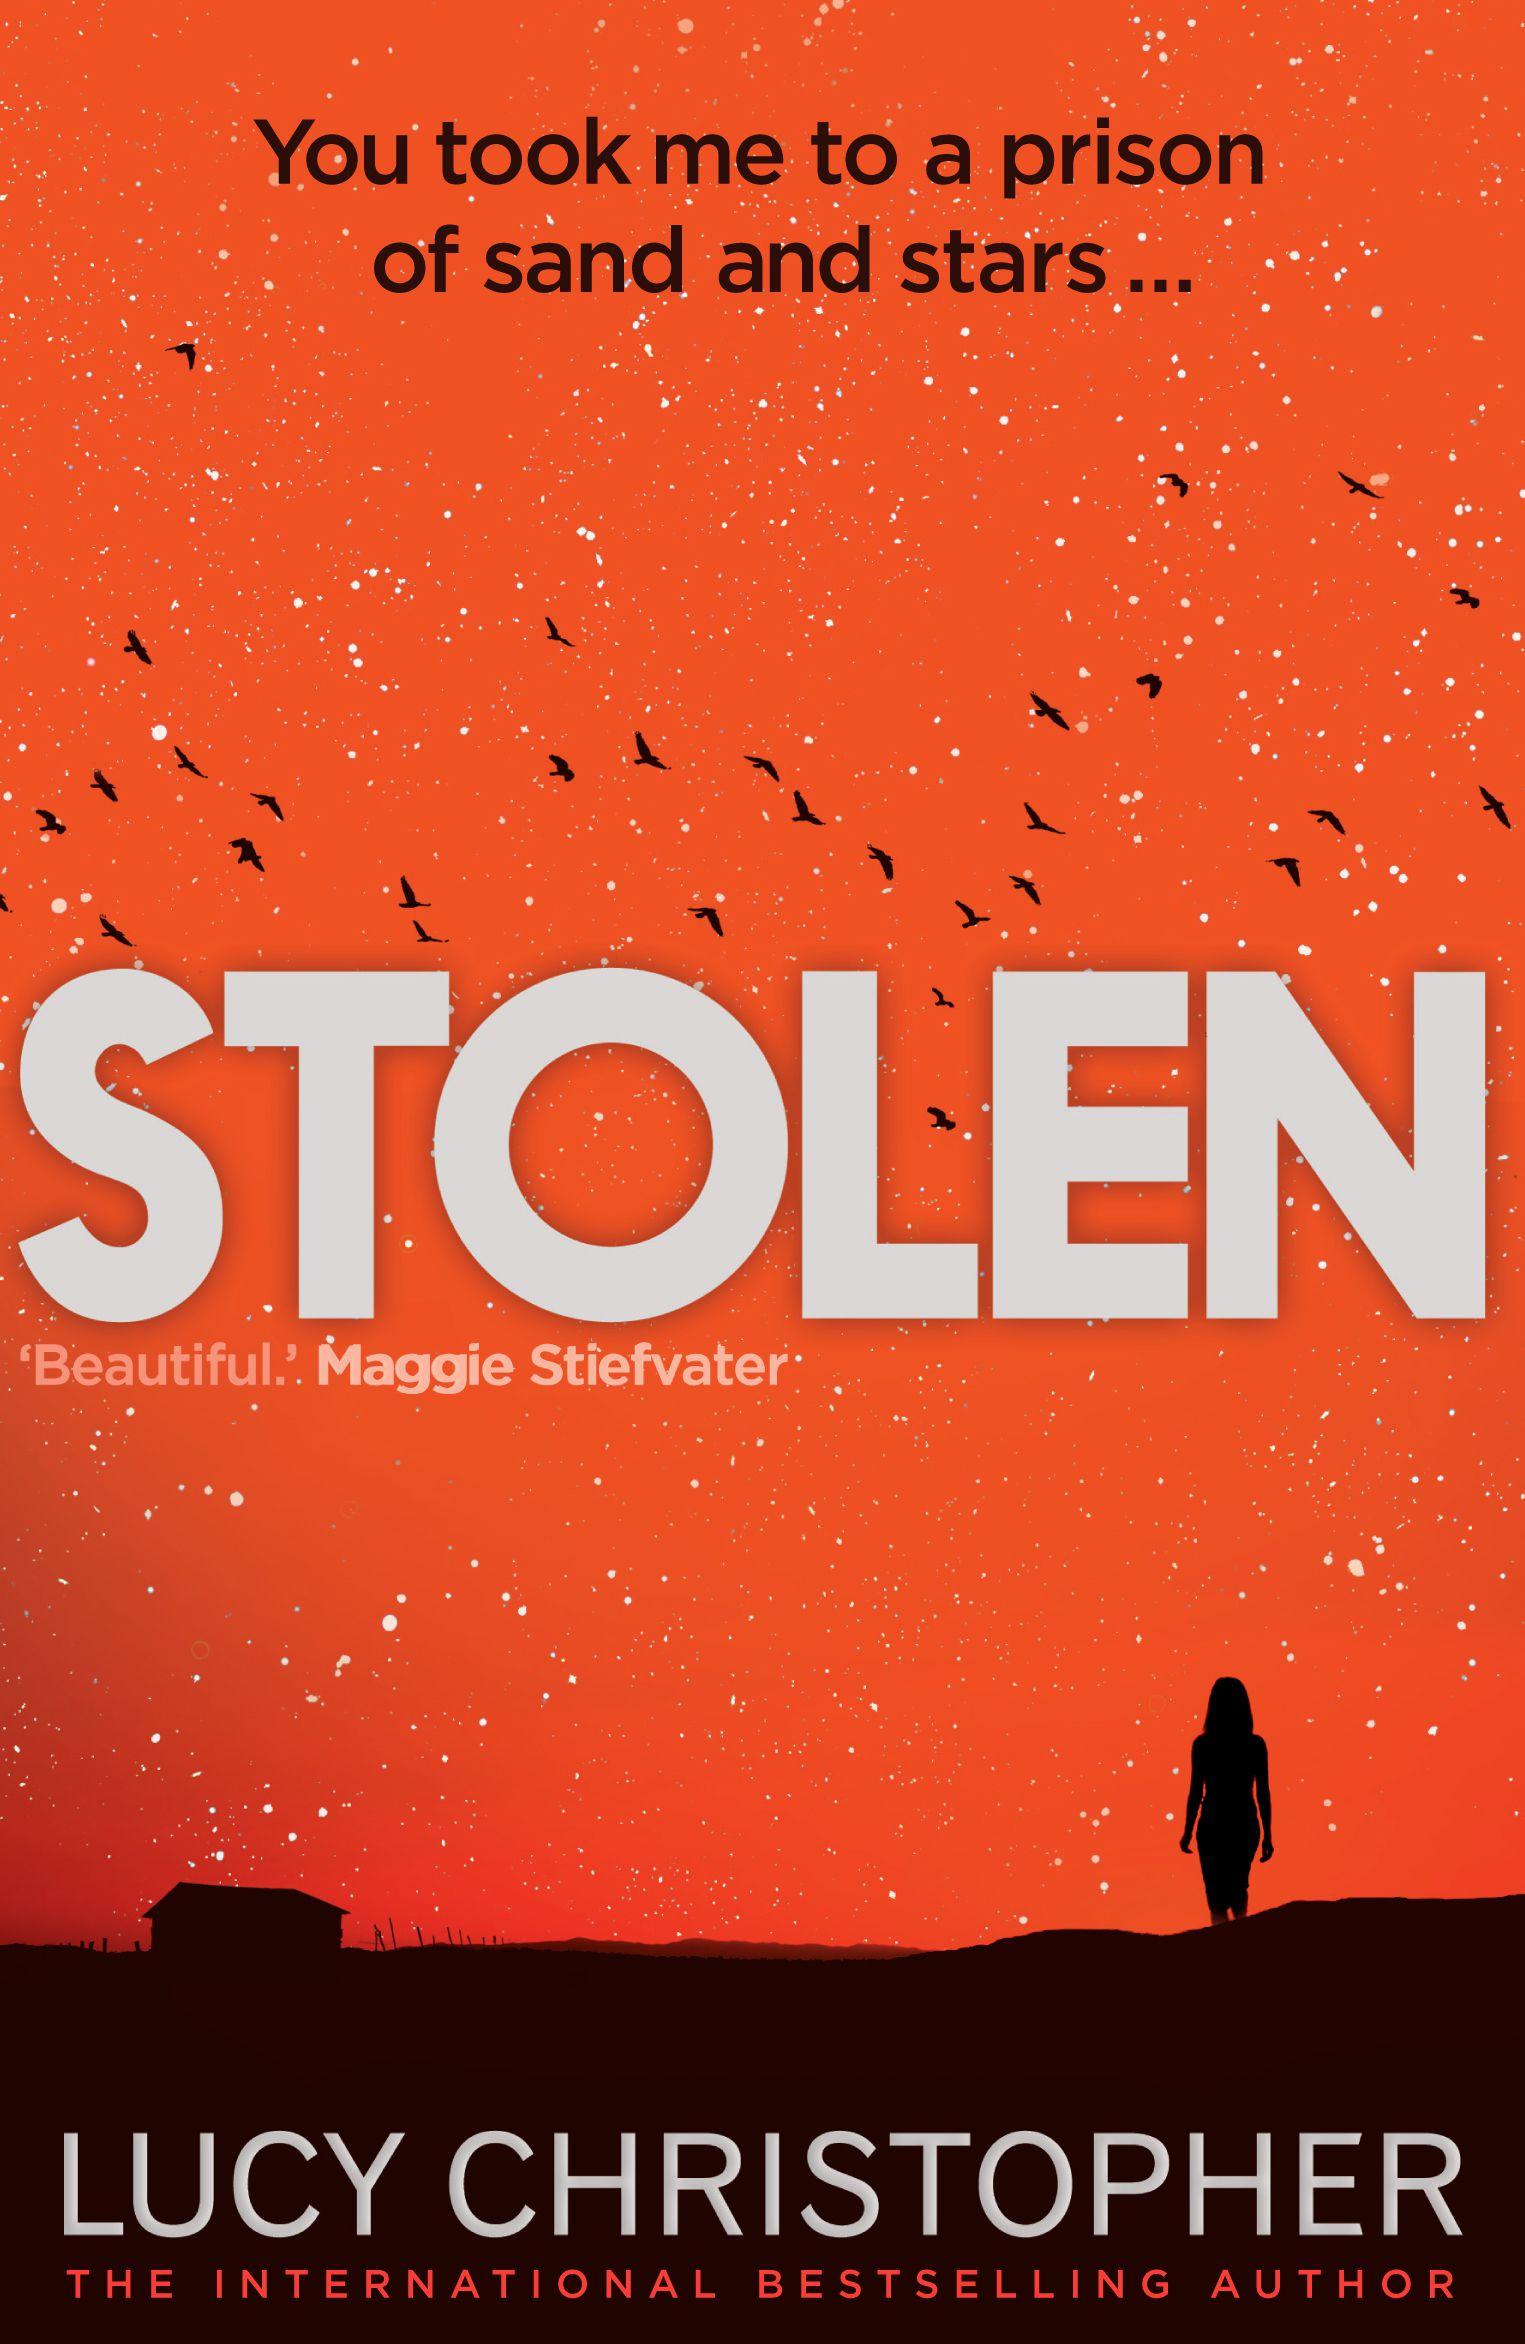 stolen-recover-20131